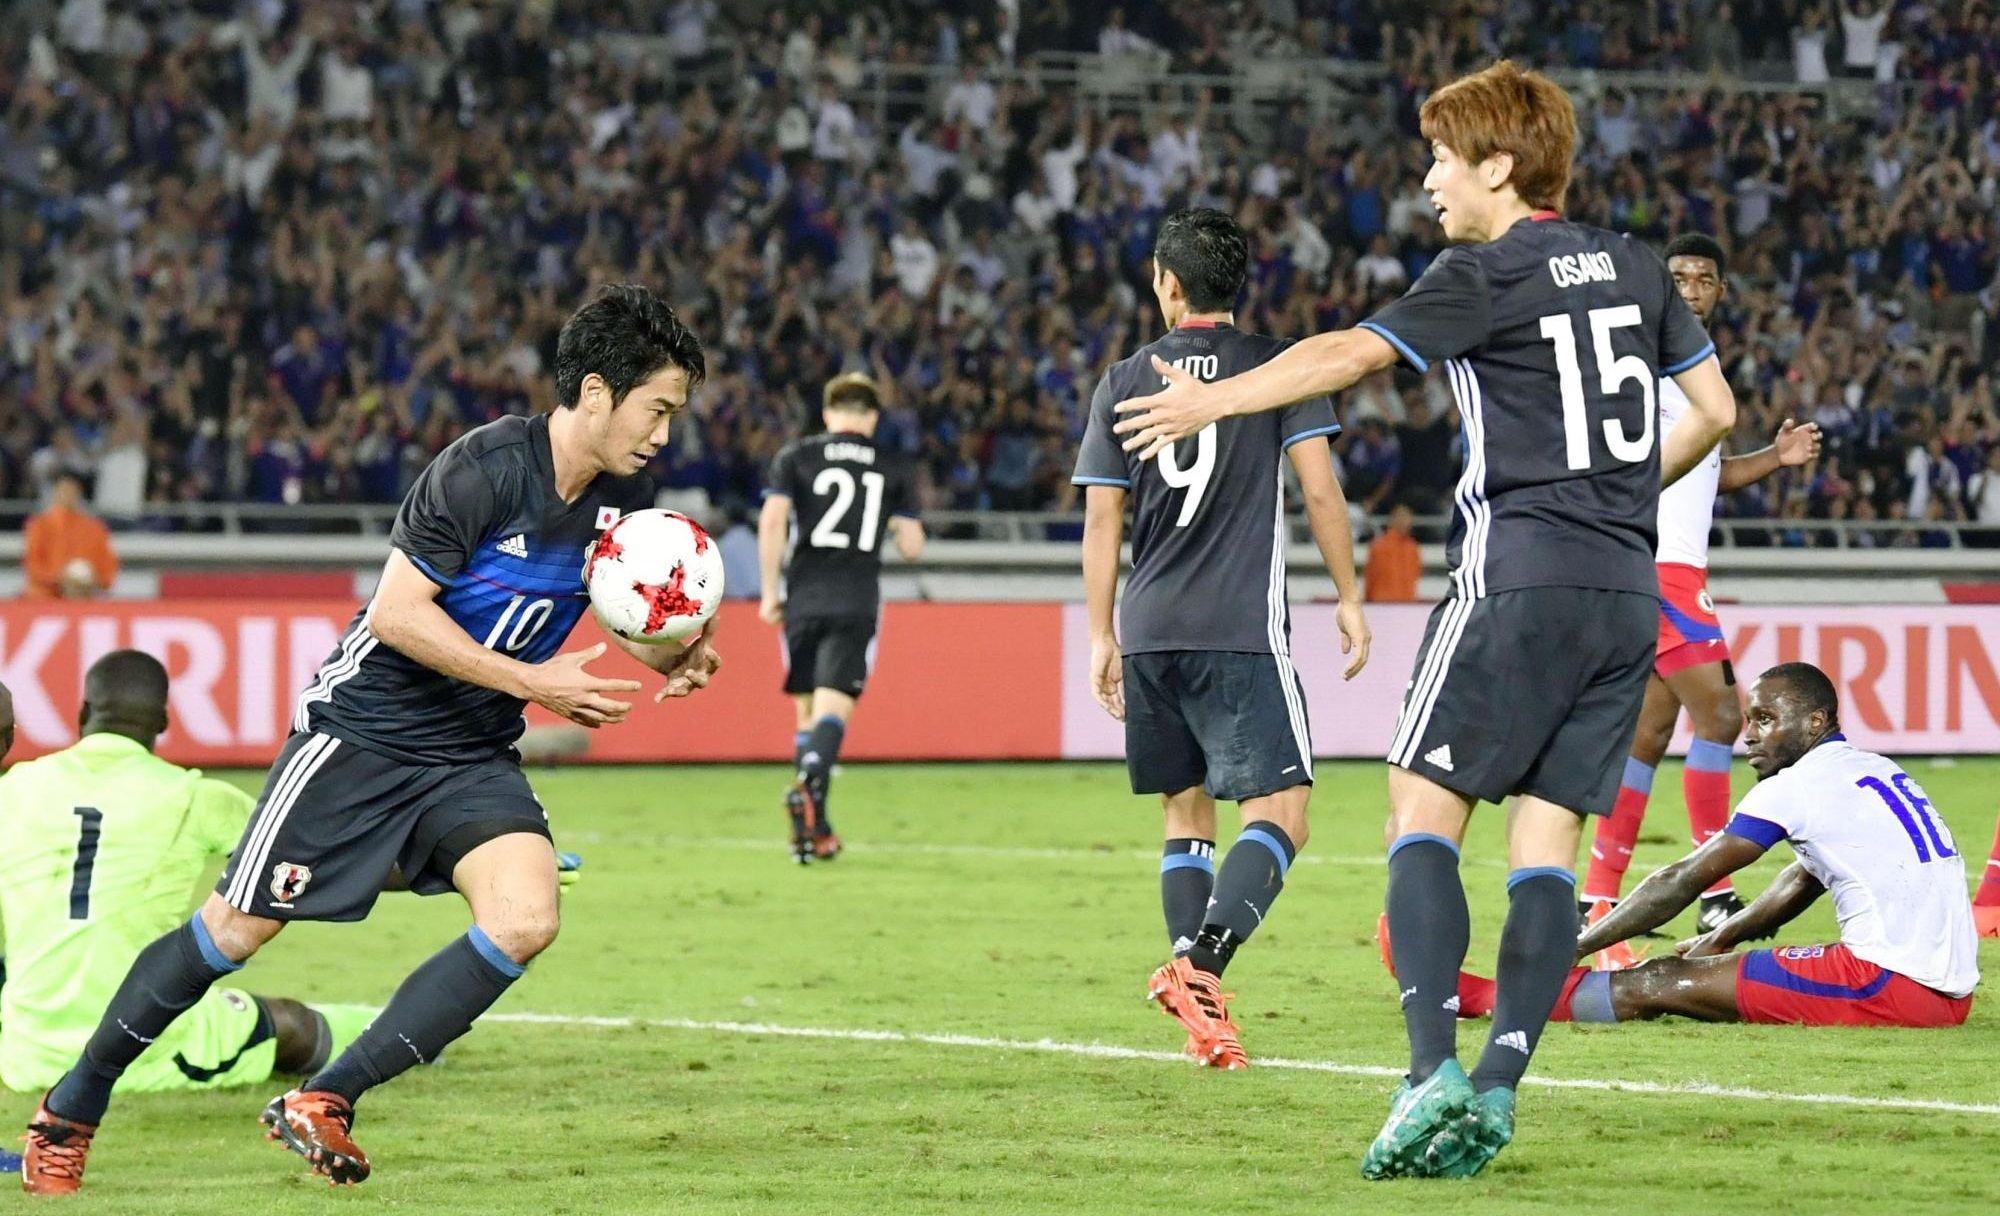 Źródło: The Japan Times